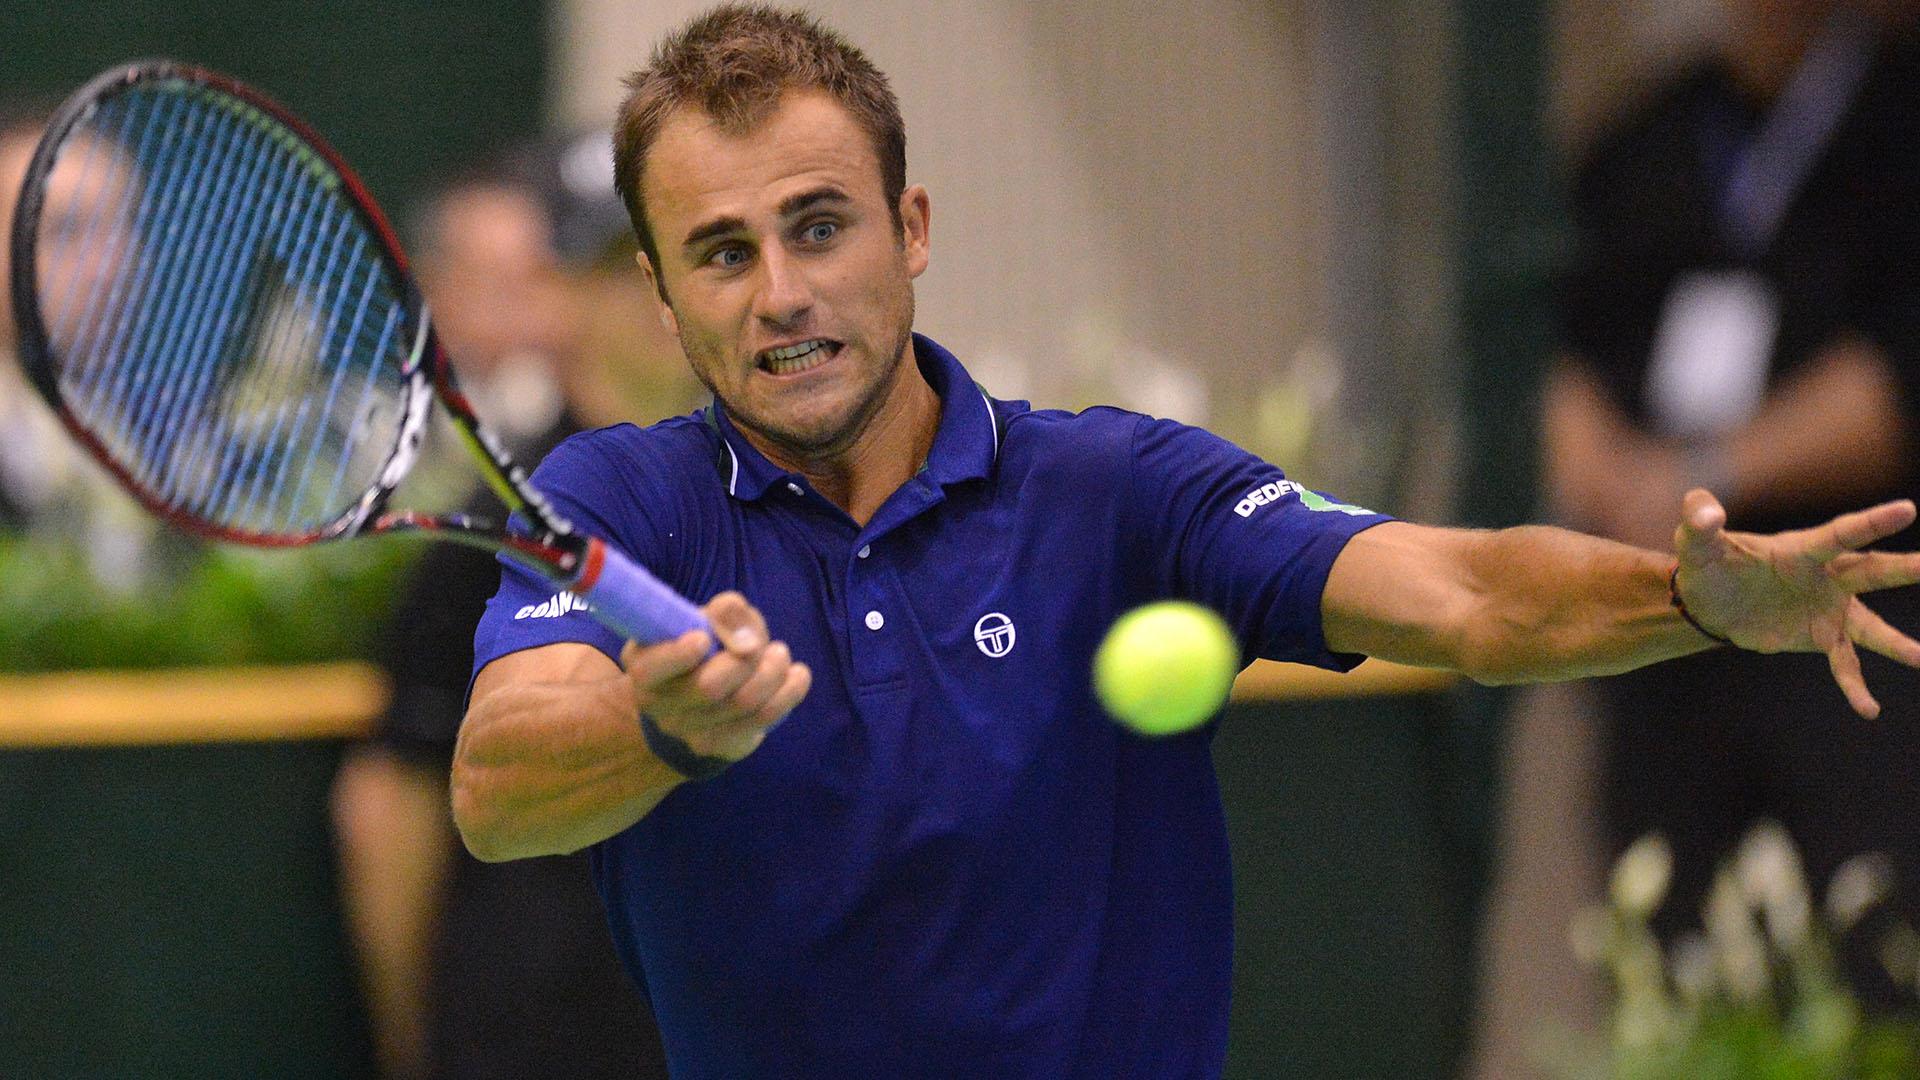 Marius Copil | Davis Cup vs Croatia